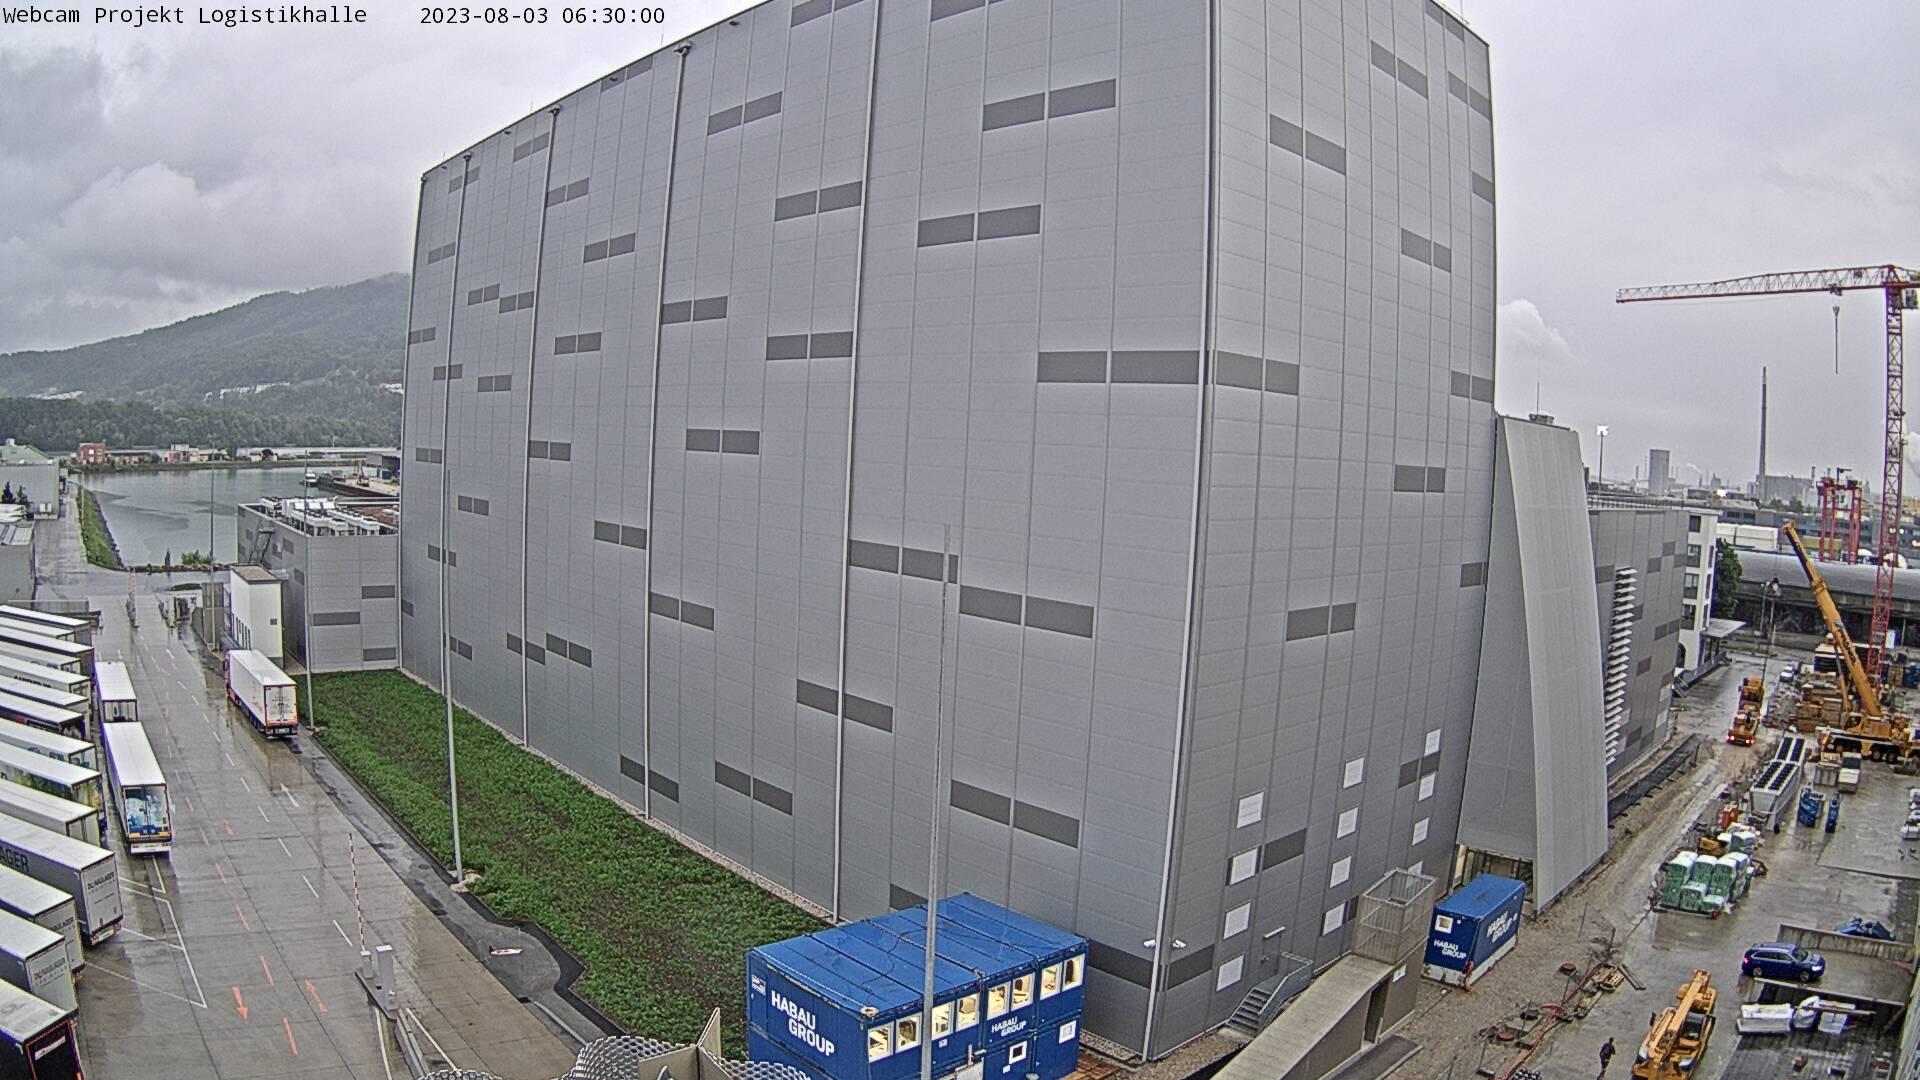 Webcam 'Projekt Neuland'